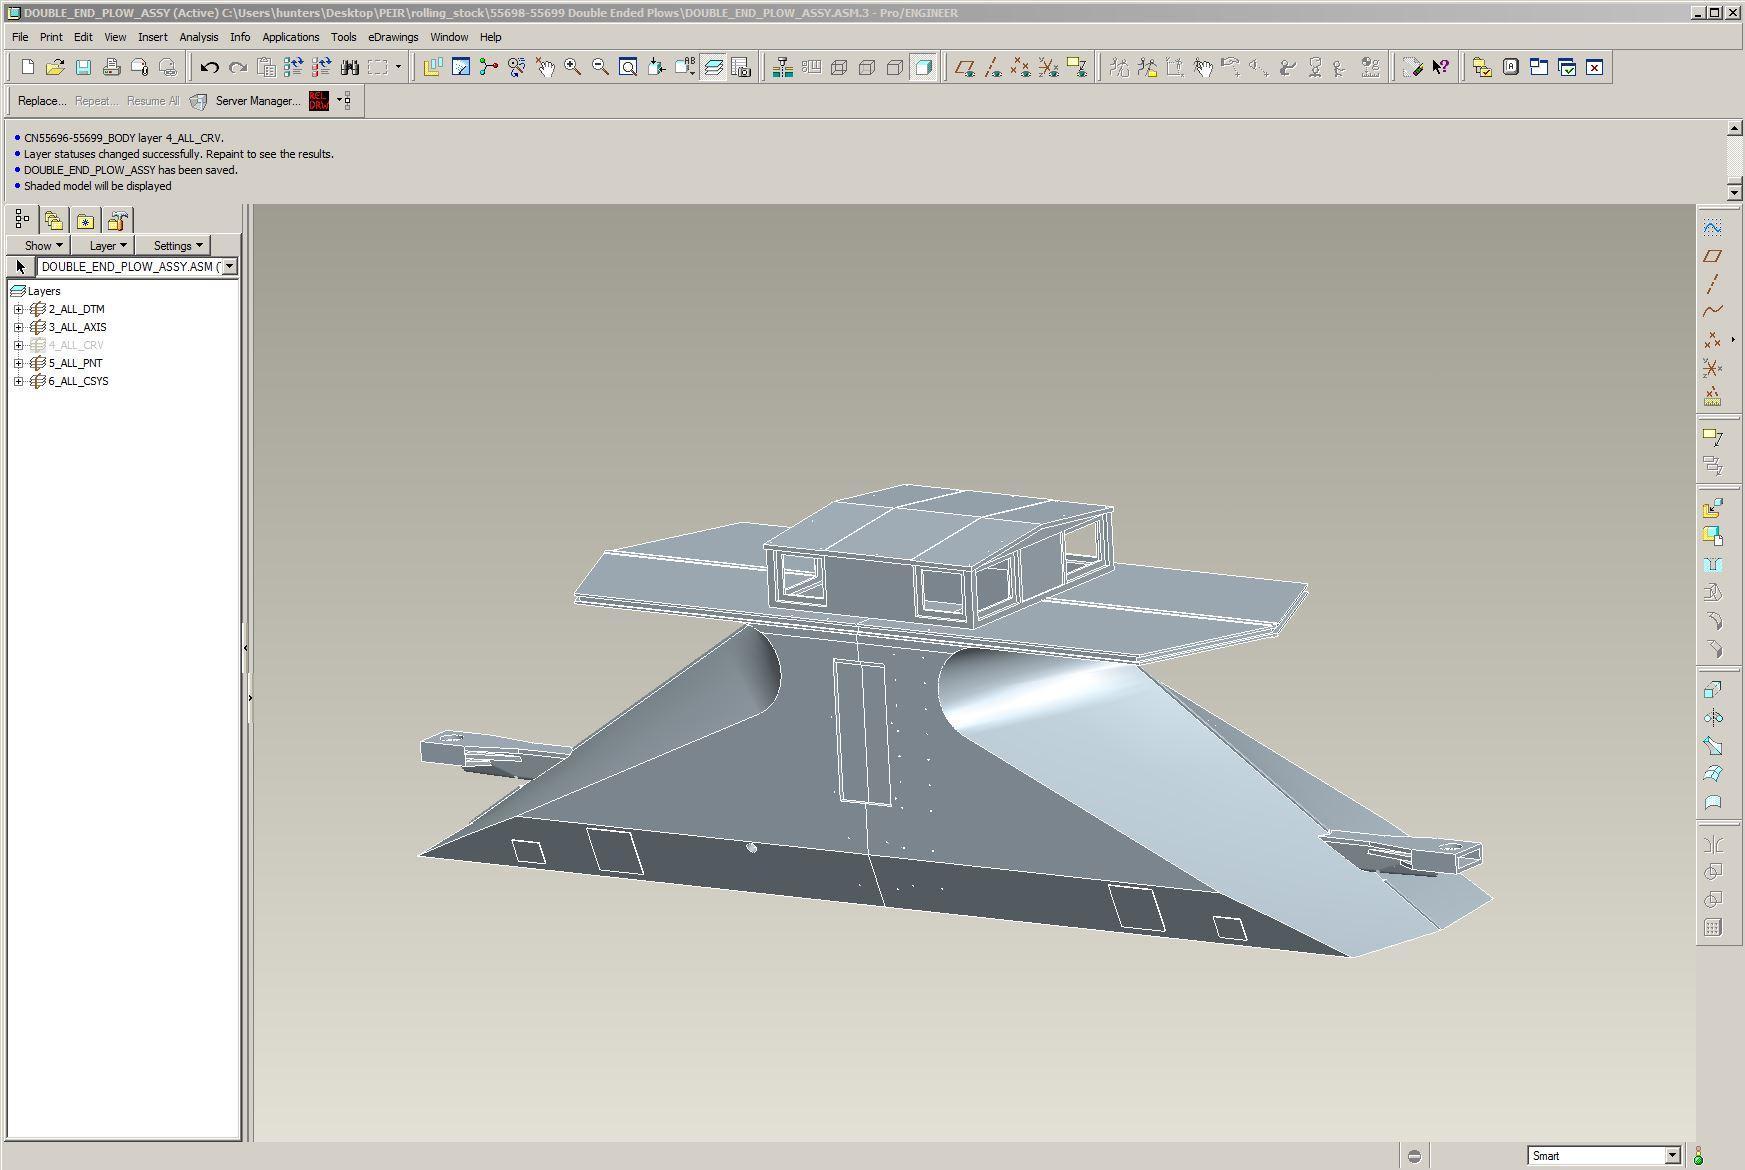 HO Scale CNR Snowplows | Shapeways 3D Printing Forums